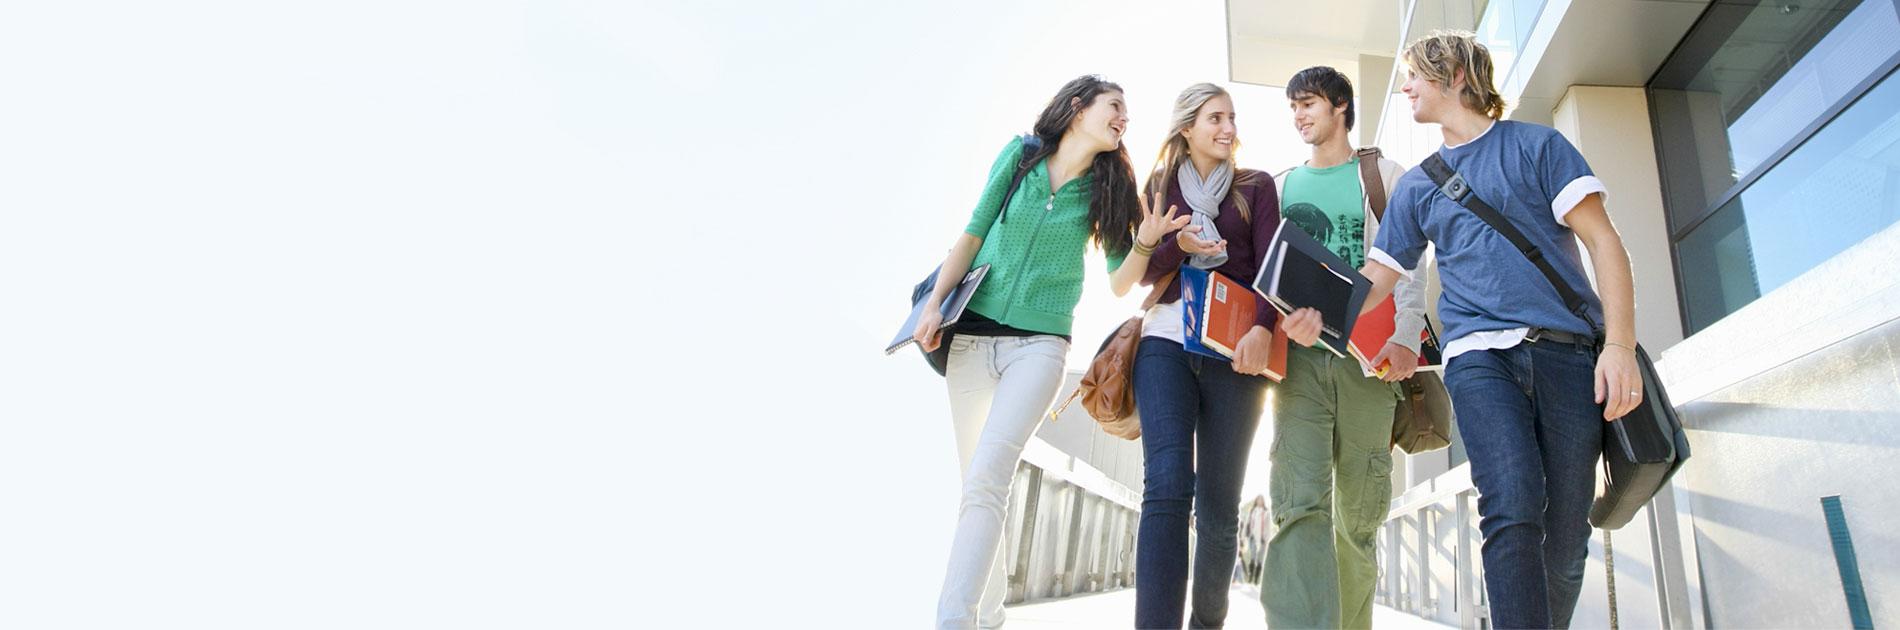 CDI College | Alberta | Recognition for CDI College Across